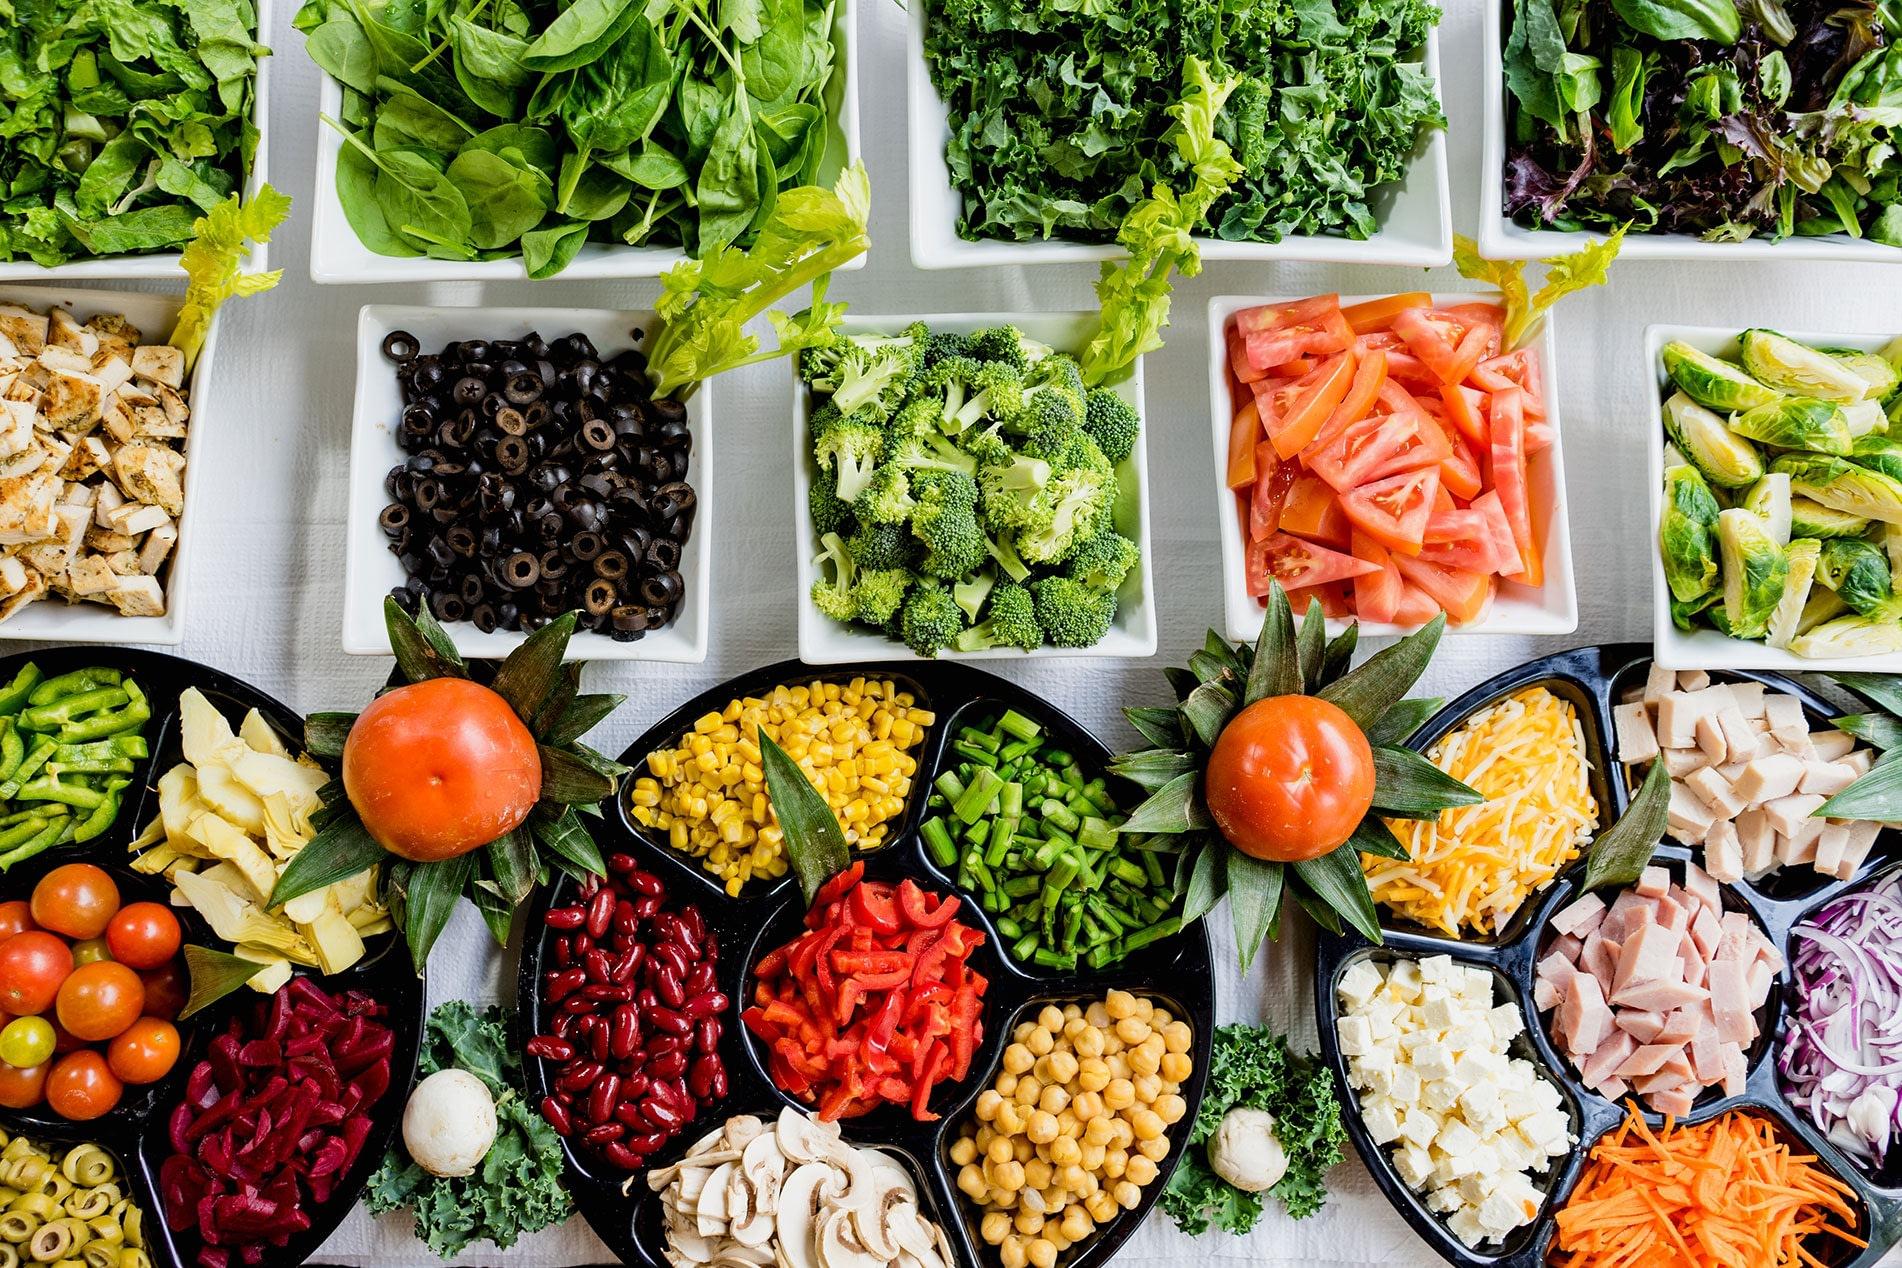 A large array of vegetables for salds